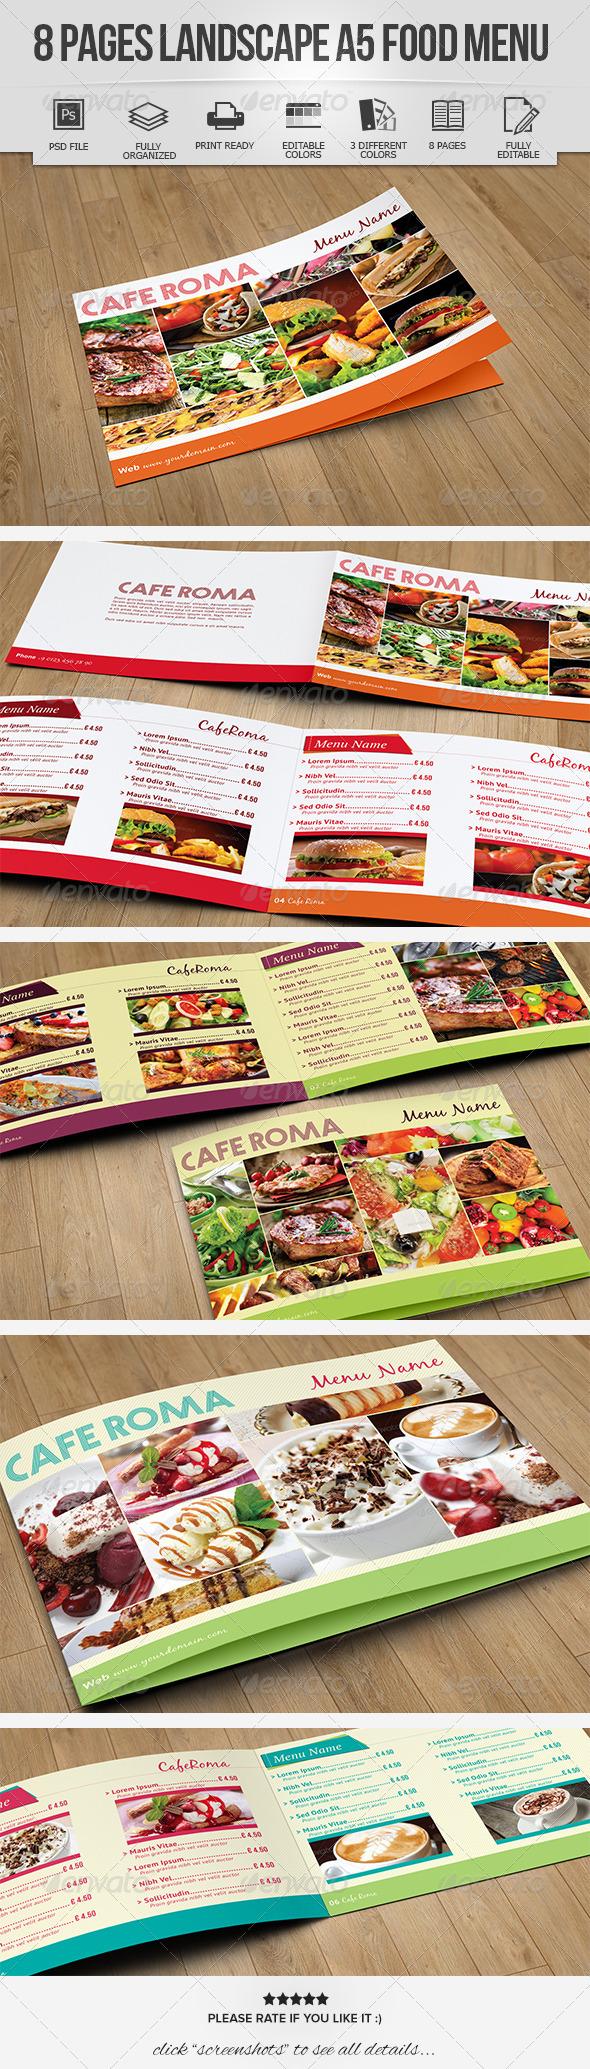 8 Pages Landscape A5 Food Menu - Food Menus Print Templates